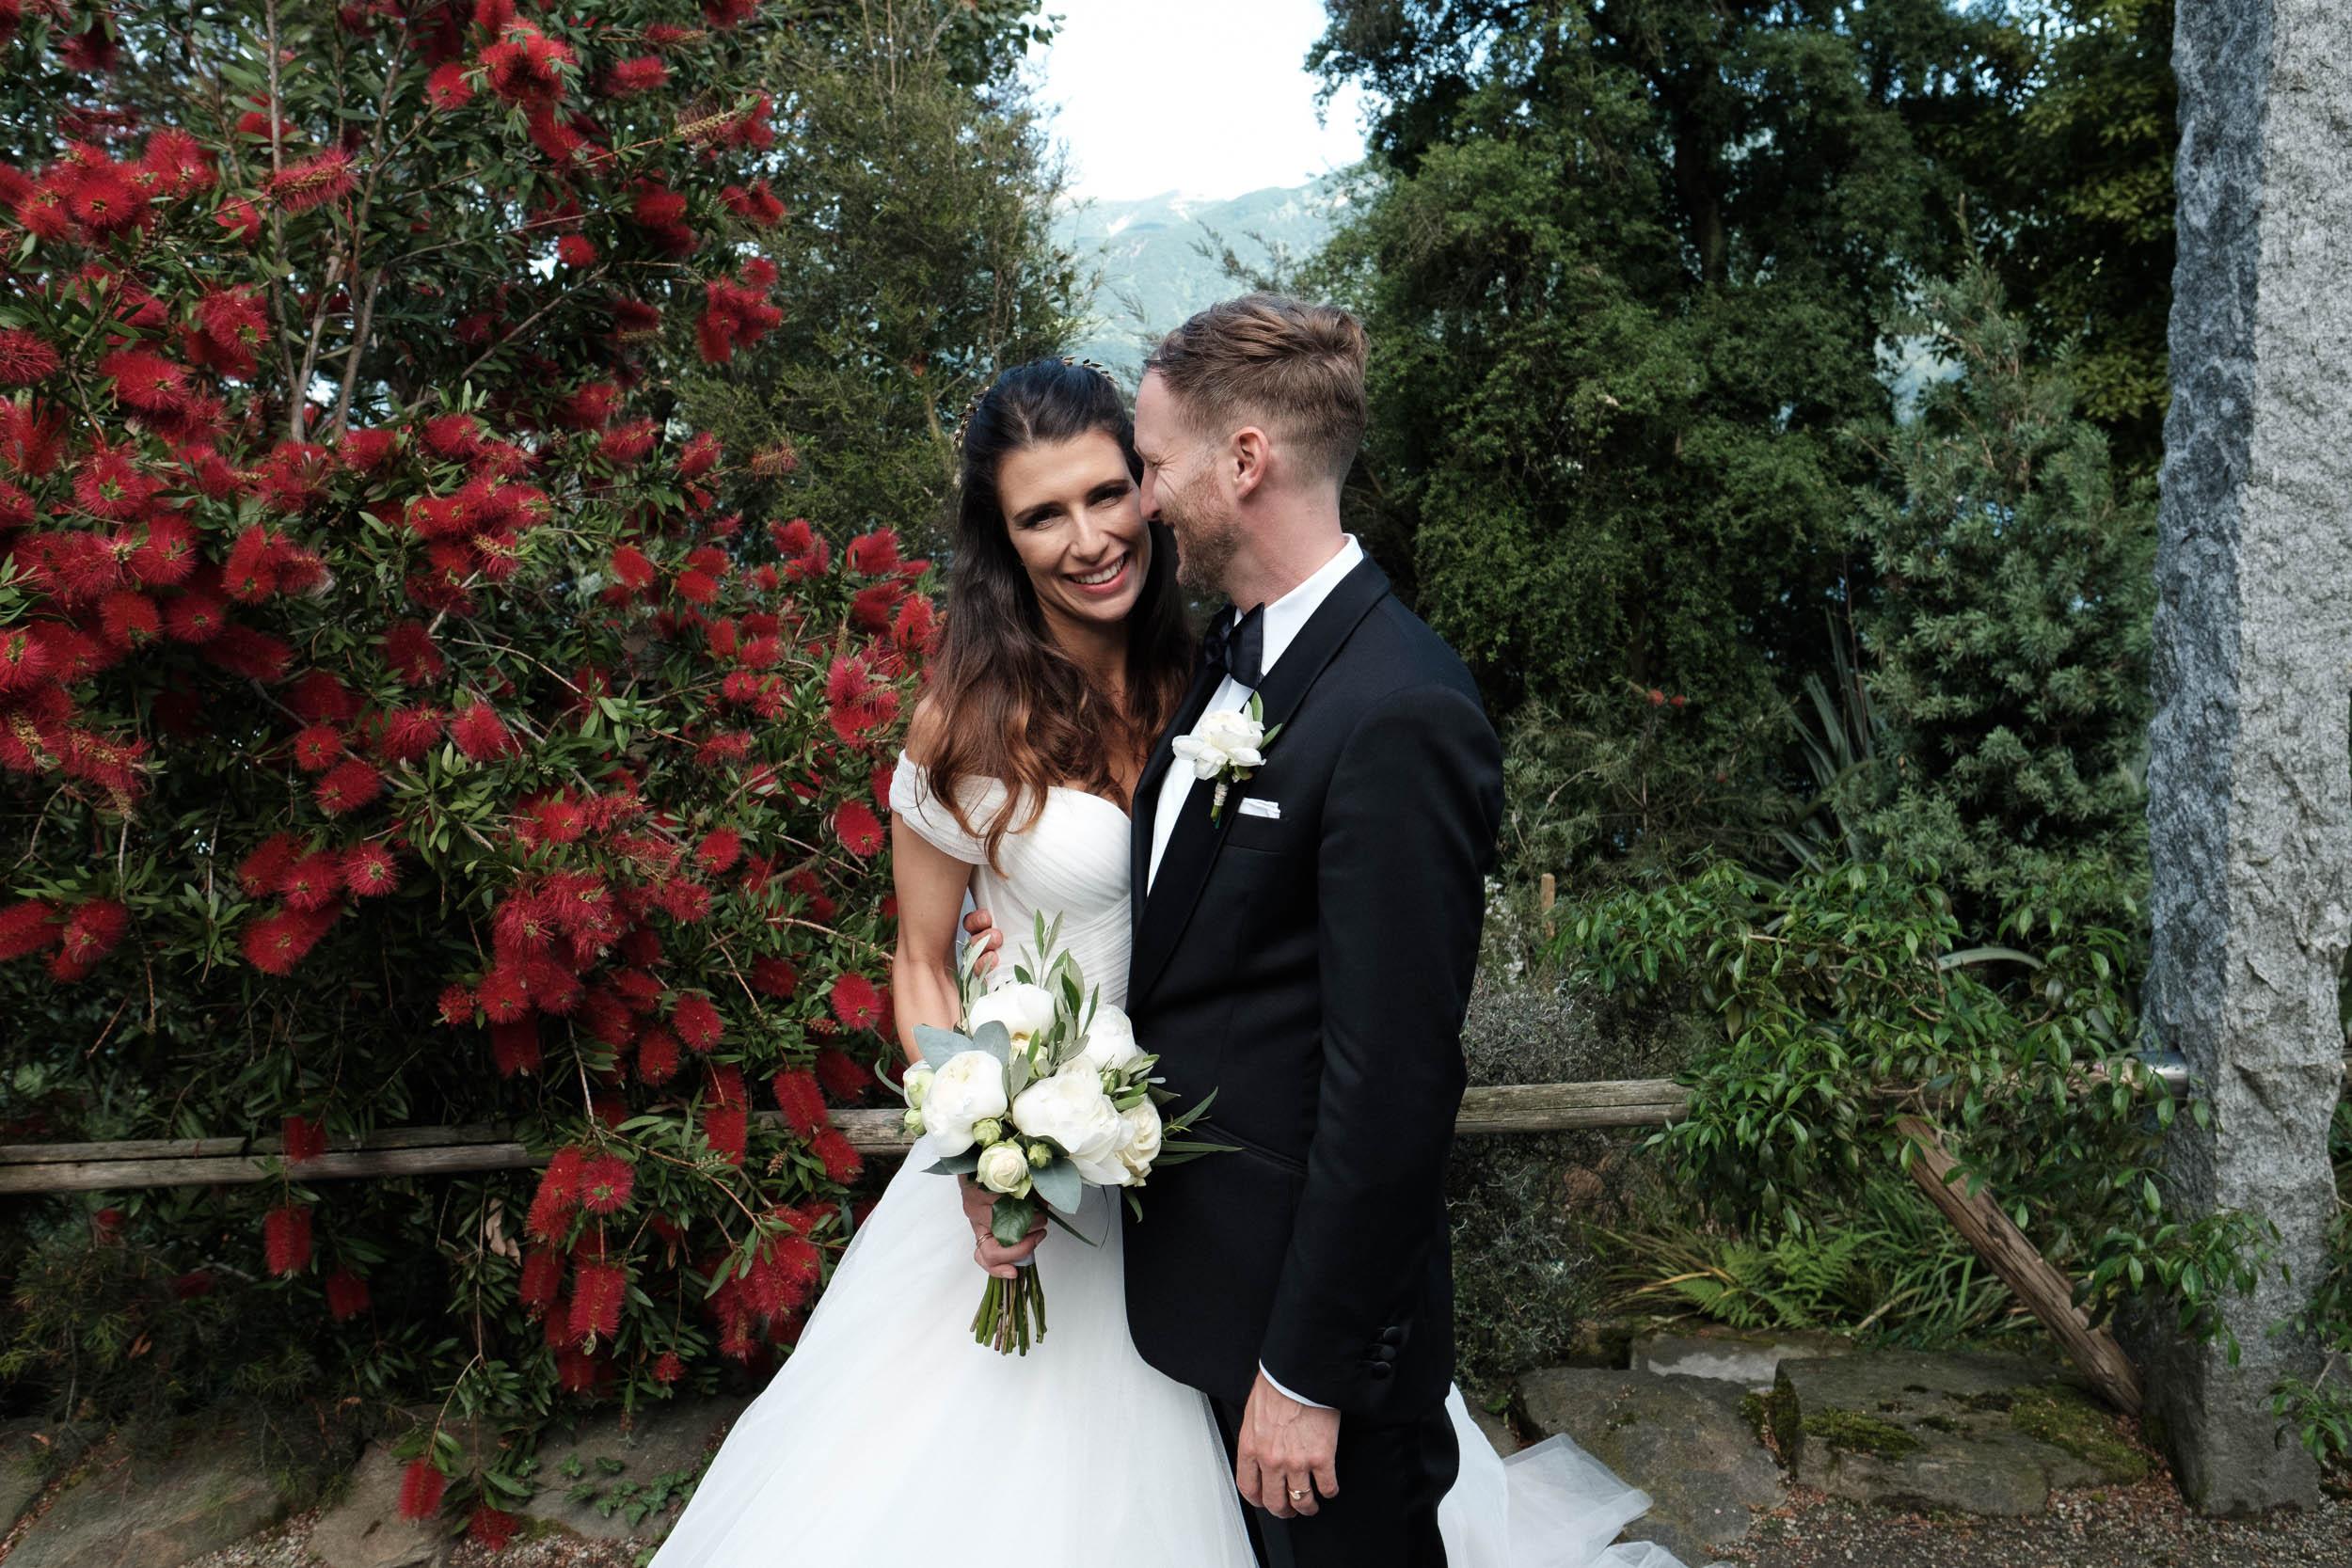 olivia-andreas-wedding-switzerland-407.jpg